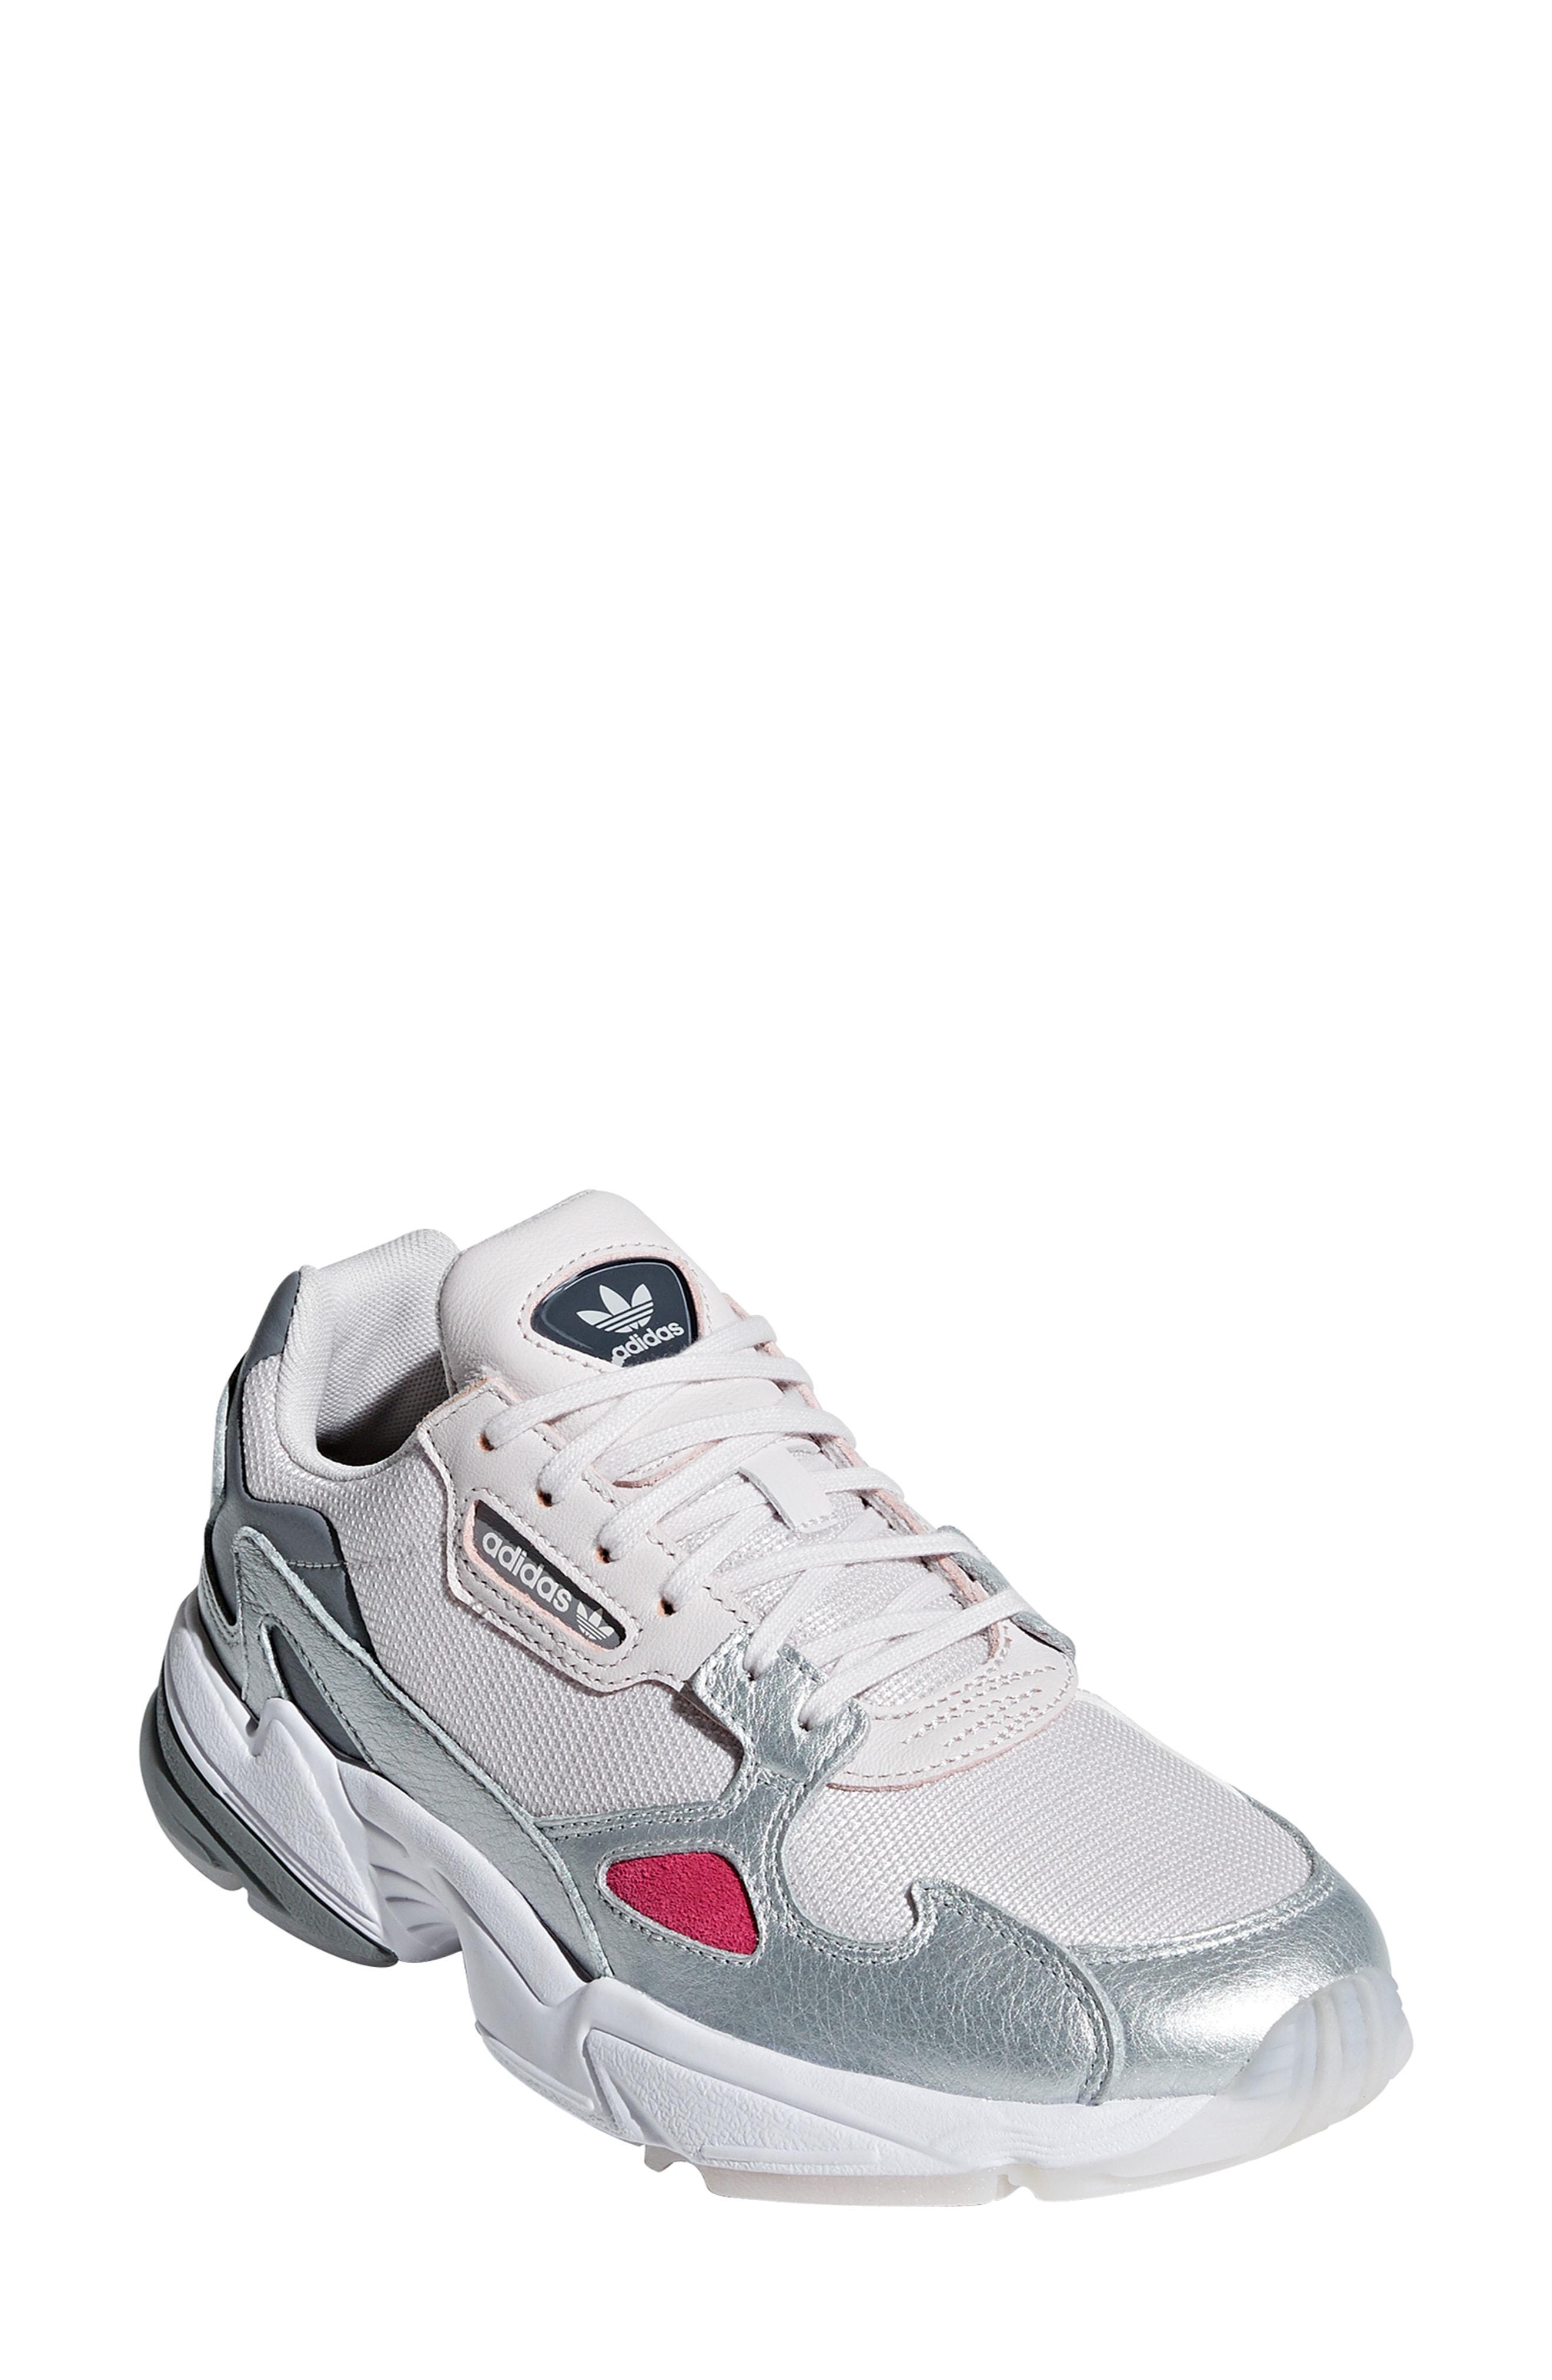 Adidas - Multicolor Falcon Sneaker - Lyst. View fullscreen 111fac021